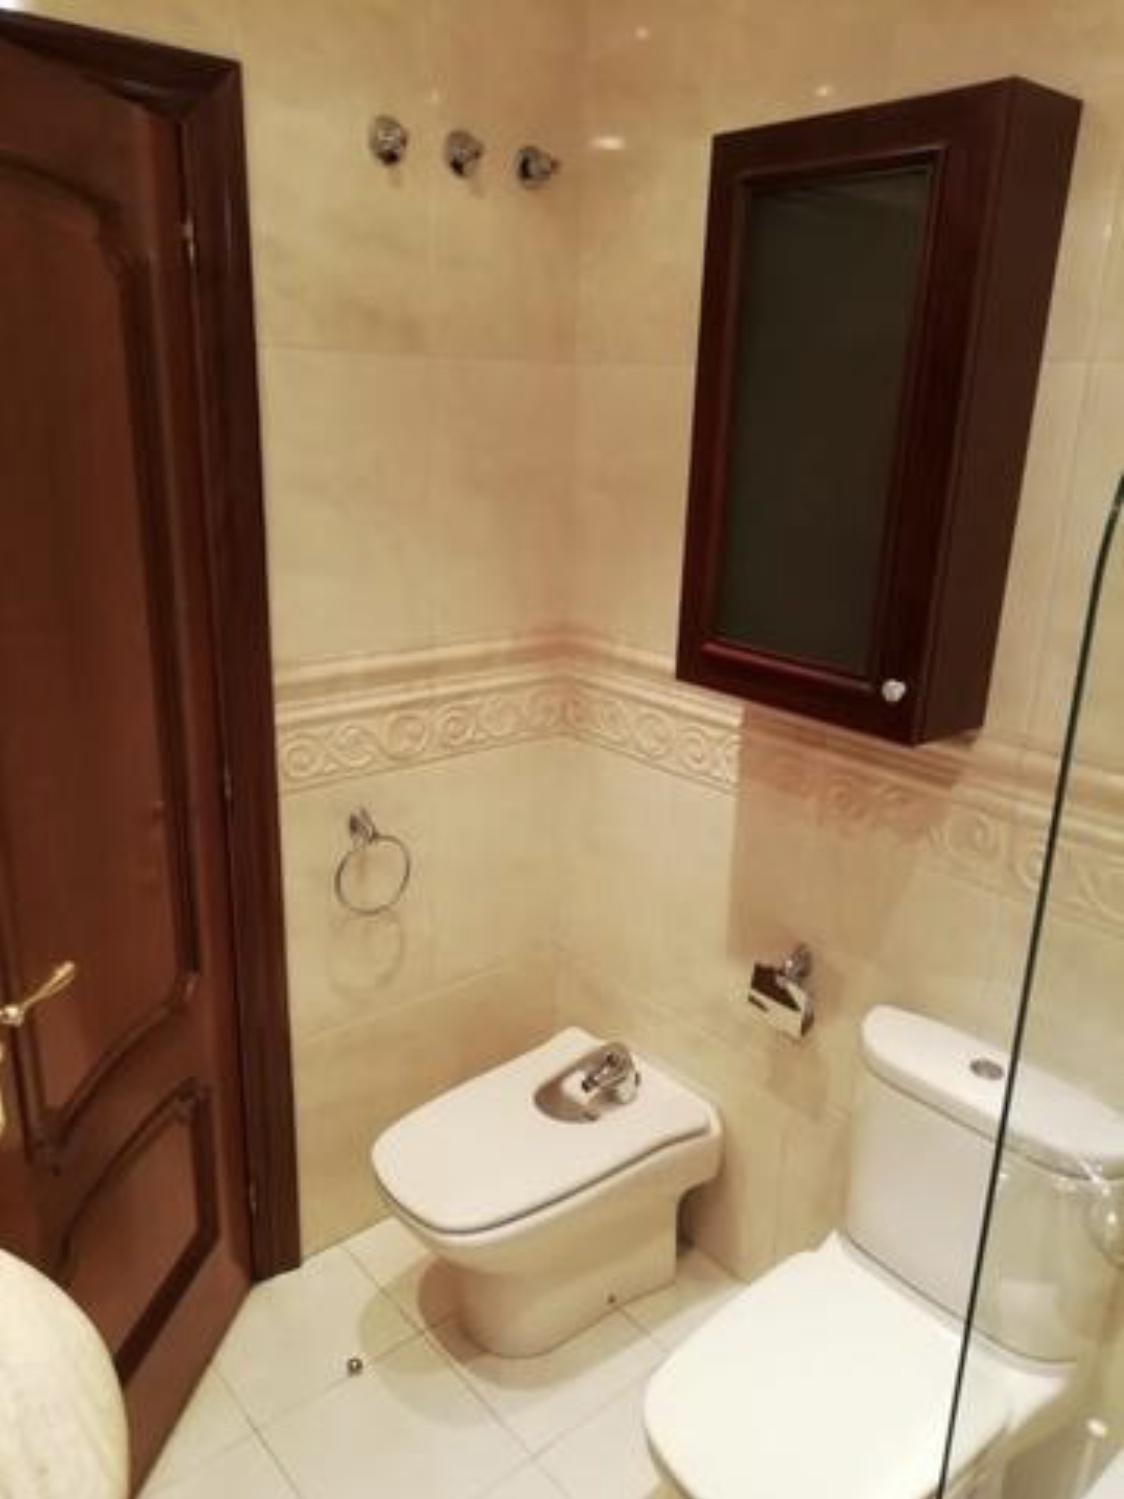 Recalde - Loft room in shared flat Bilbao